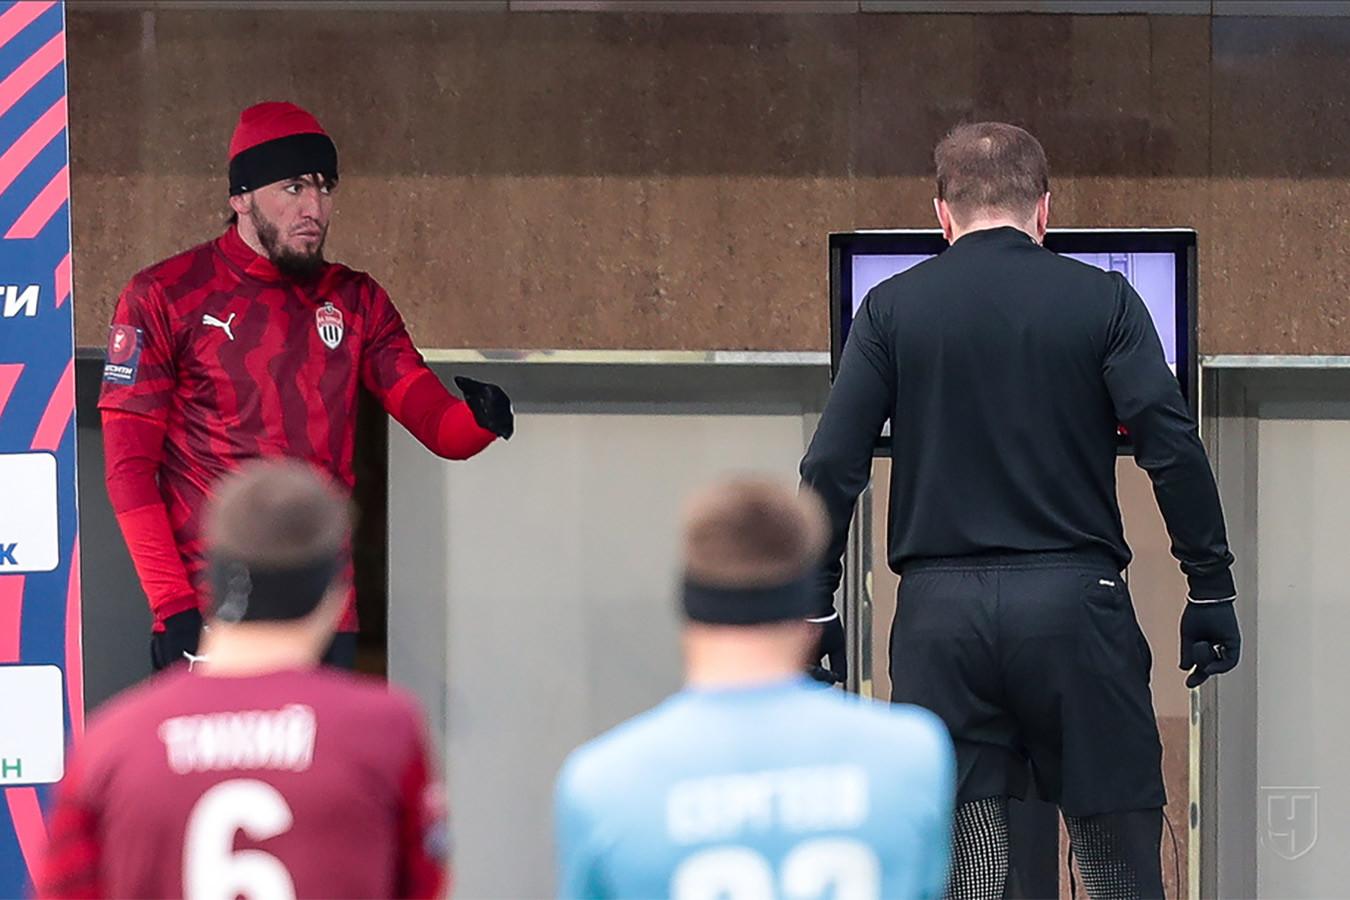 Глушаков ругался с Мирзовым, Вилков отменял красную. Фото разгрома «Химок» от «Крыльев»